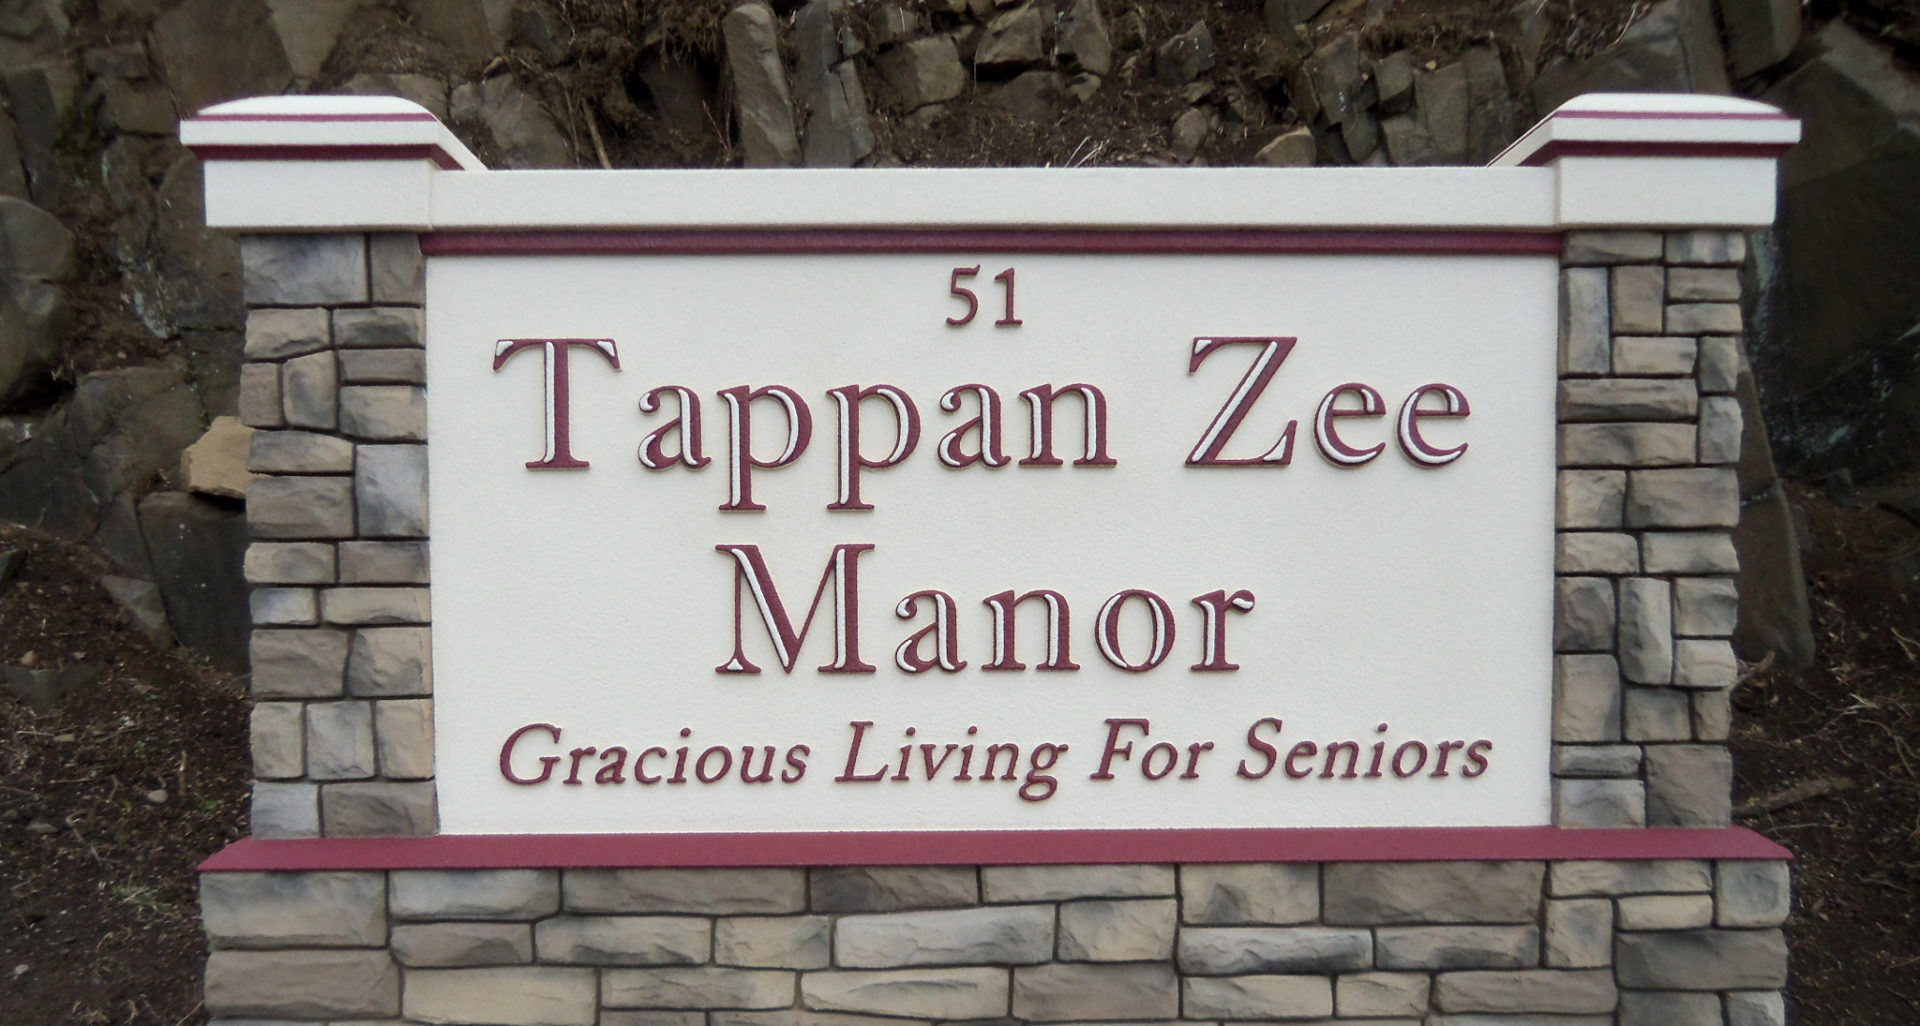 Tappan Zee Manor - Street Sign